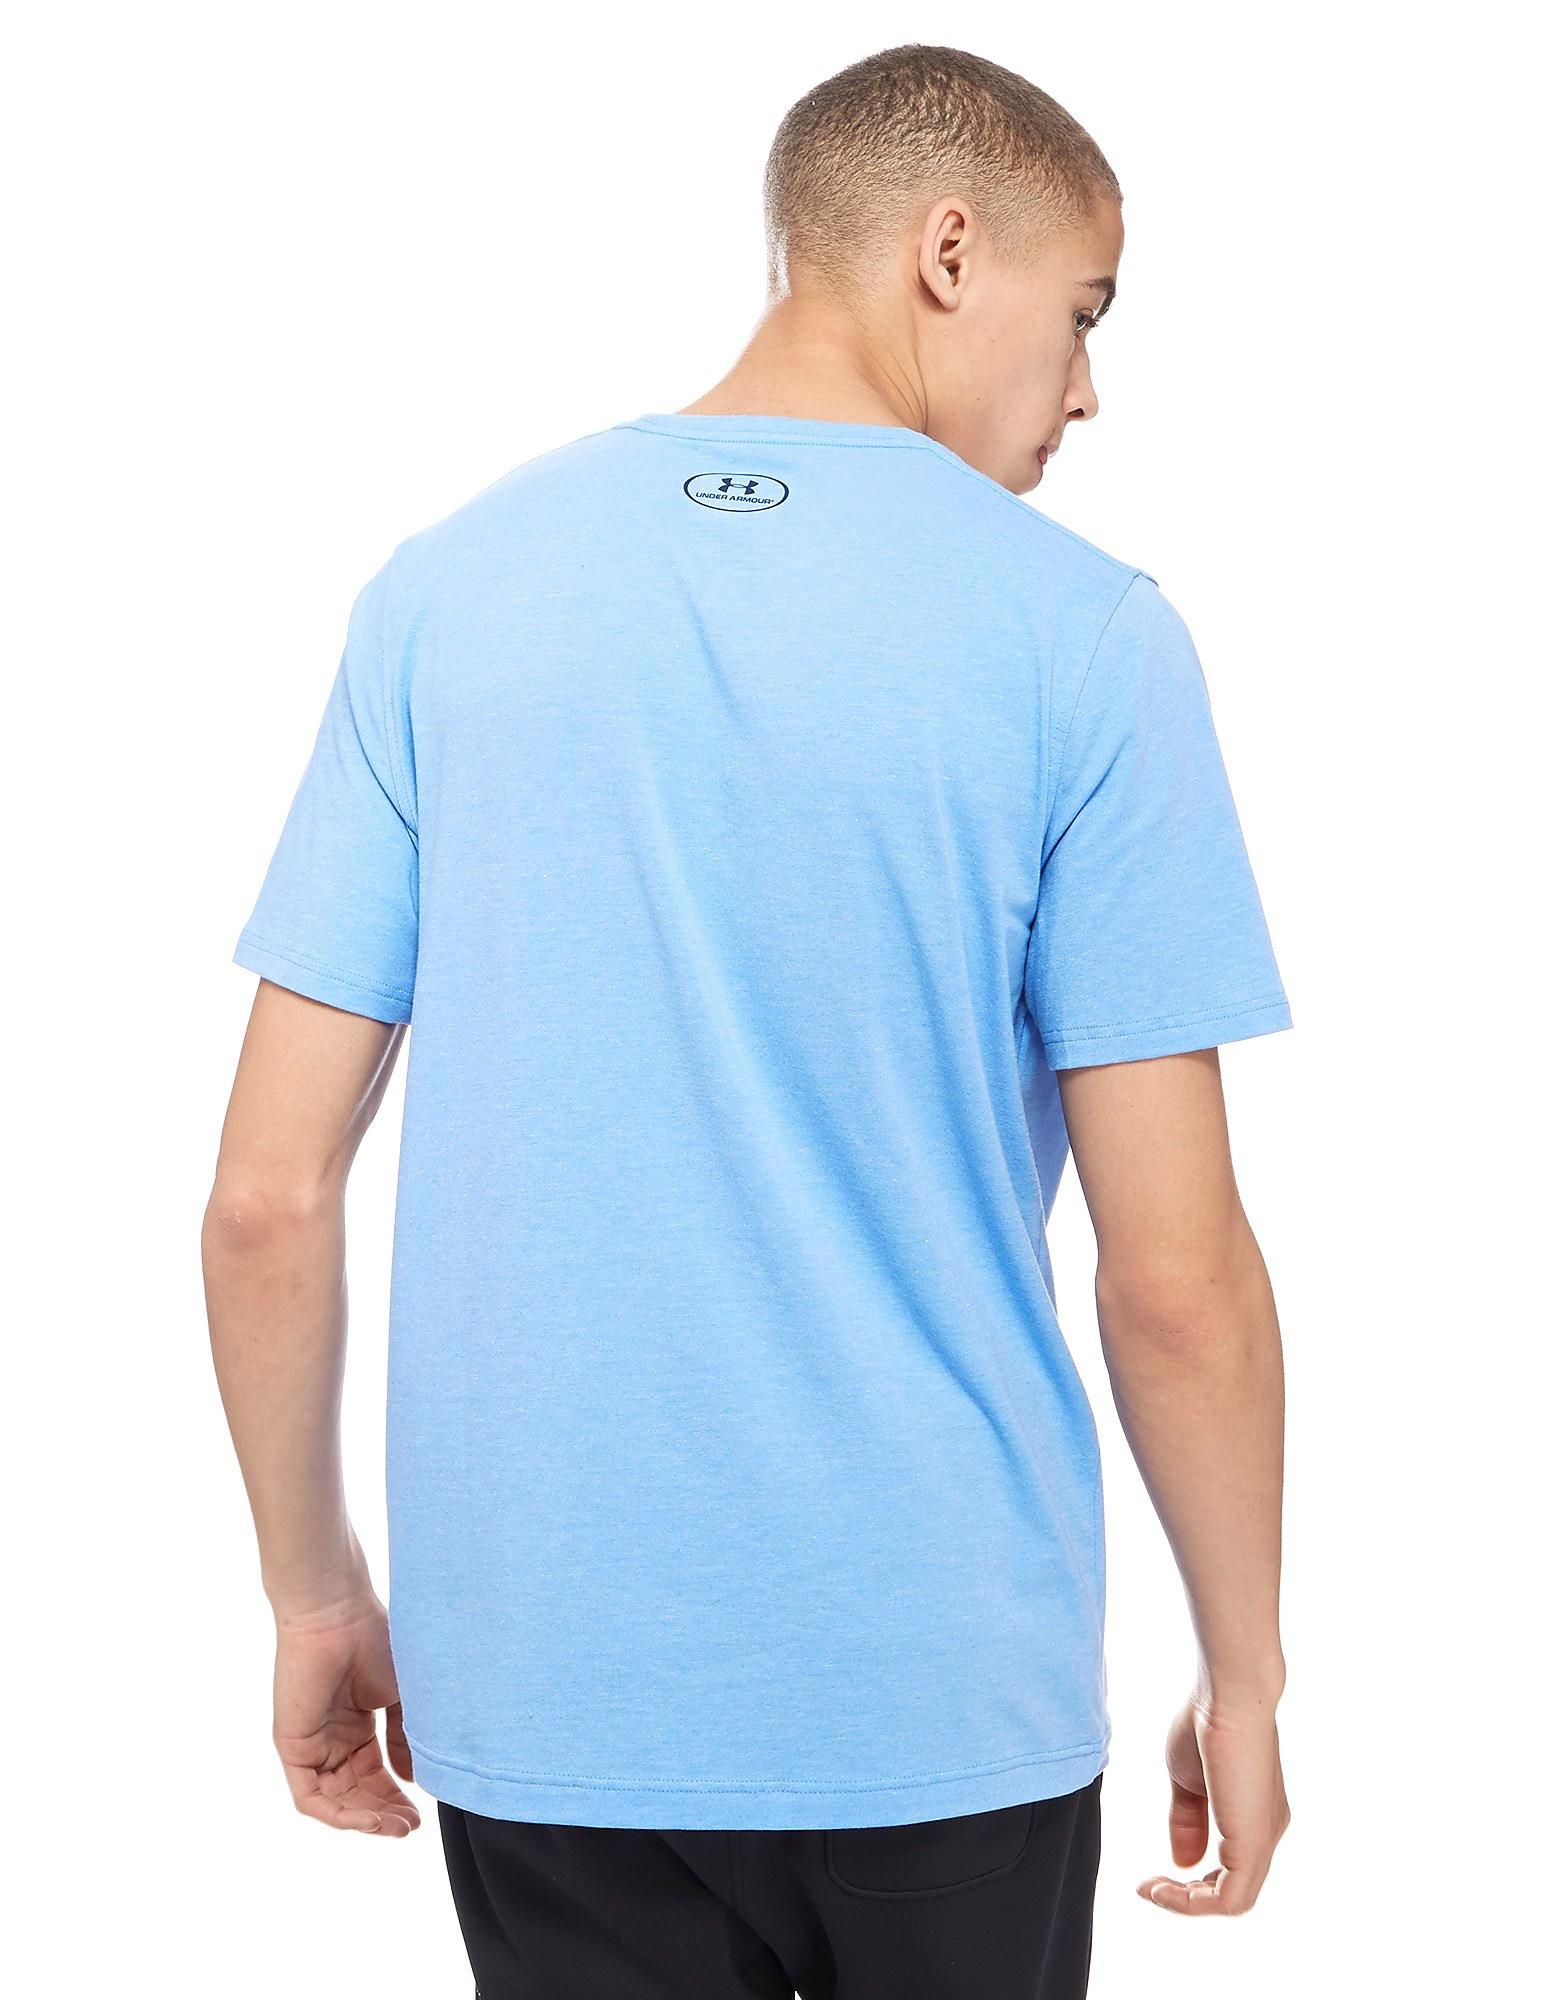 Under Armour CC T-Shirt